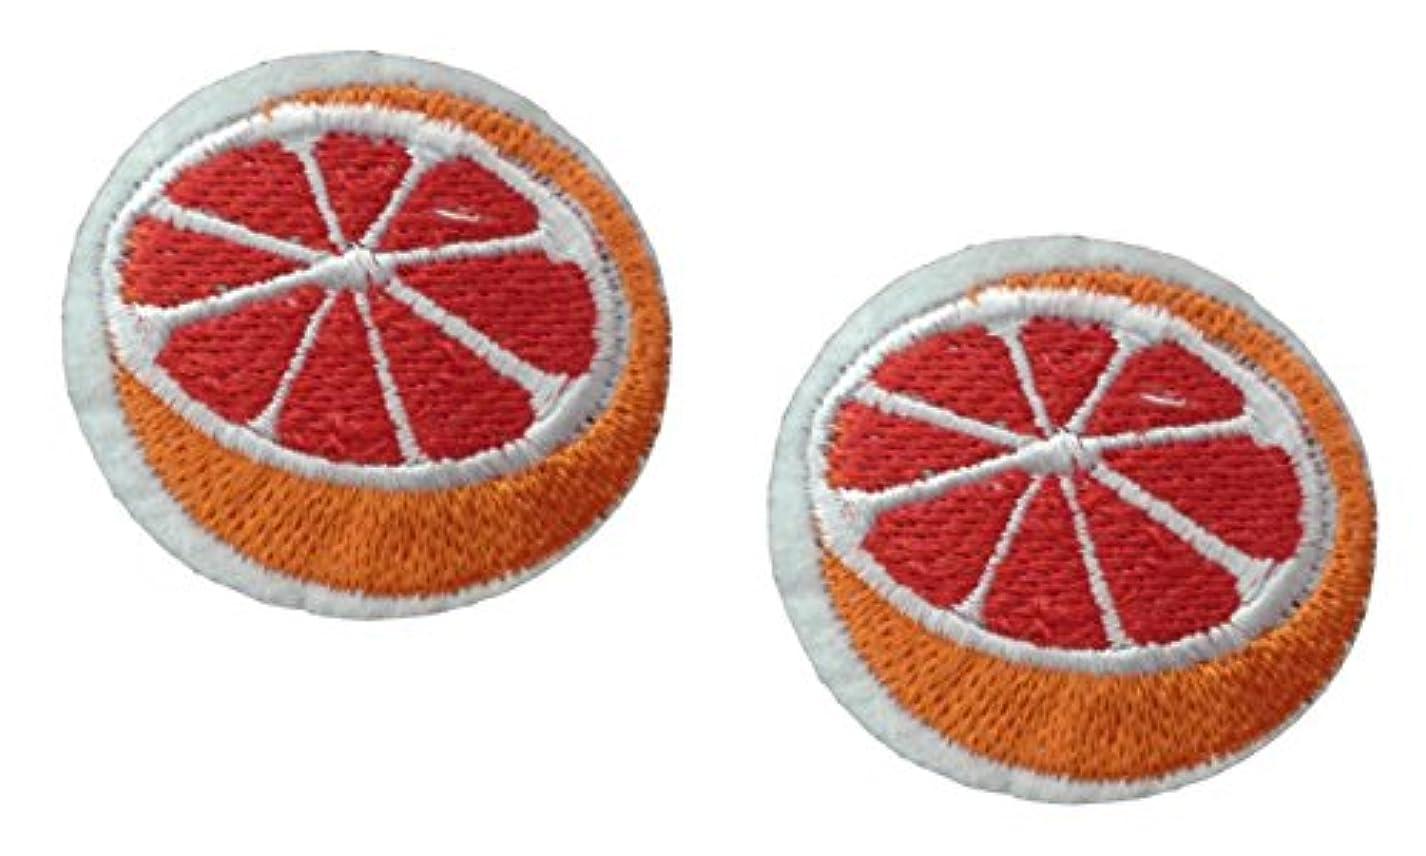 2 small pieces ORANGE Iron On Patch Fabric Applique Cut Tangerine Citrus Fruit Food Motif Children Decal 1.6 x 1.5 inches (4 x 3.8 cm) nqb038506606693